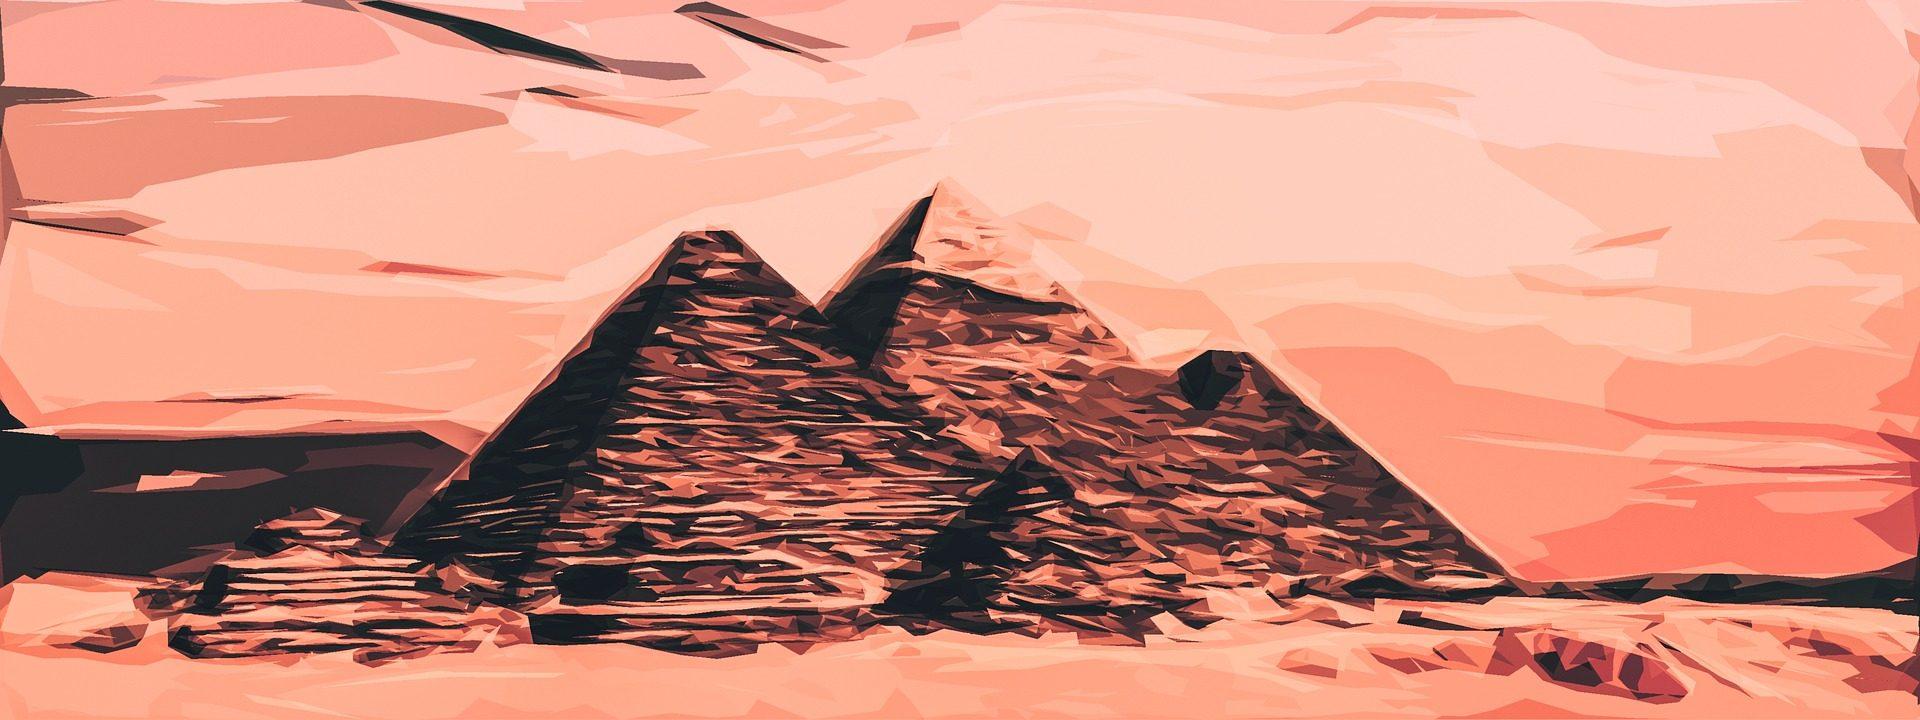 pirámides, 埃及, 图片, 帆布, 中风, 绘画 - 高清壁纸 - 教授-falken.com